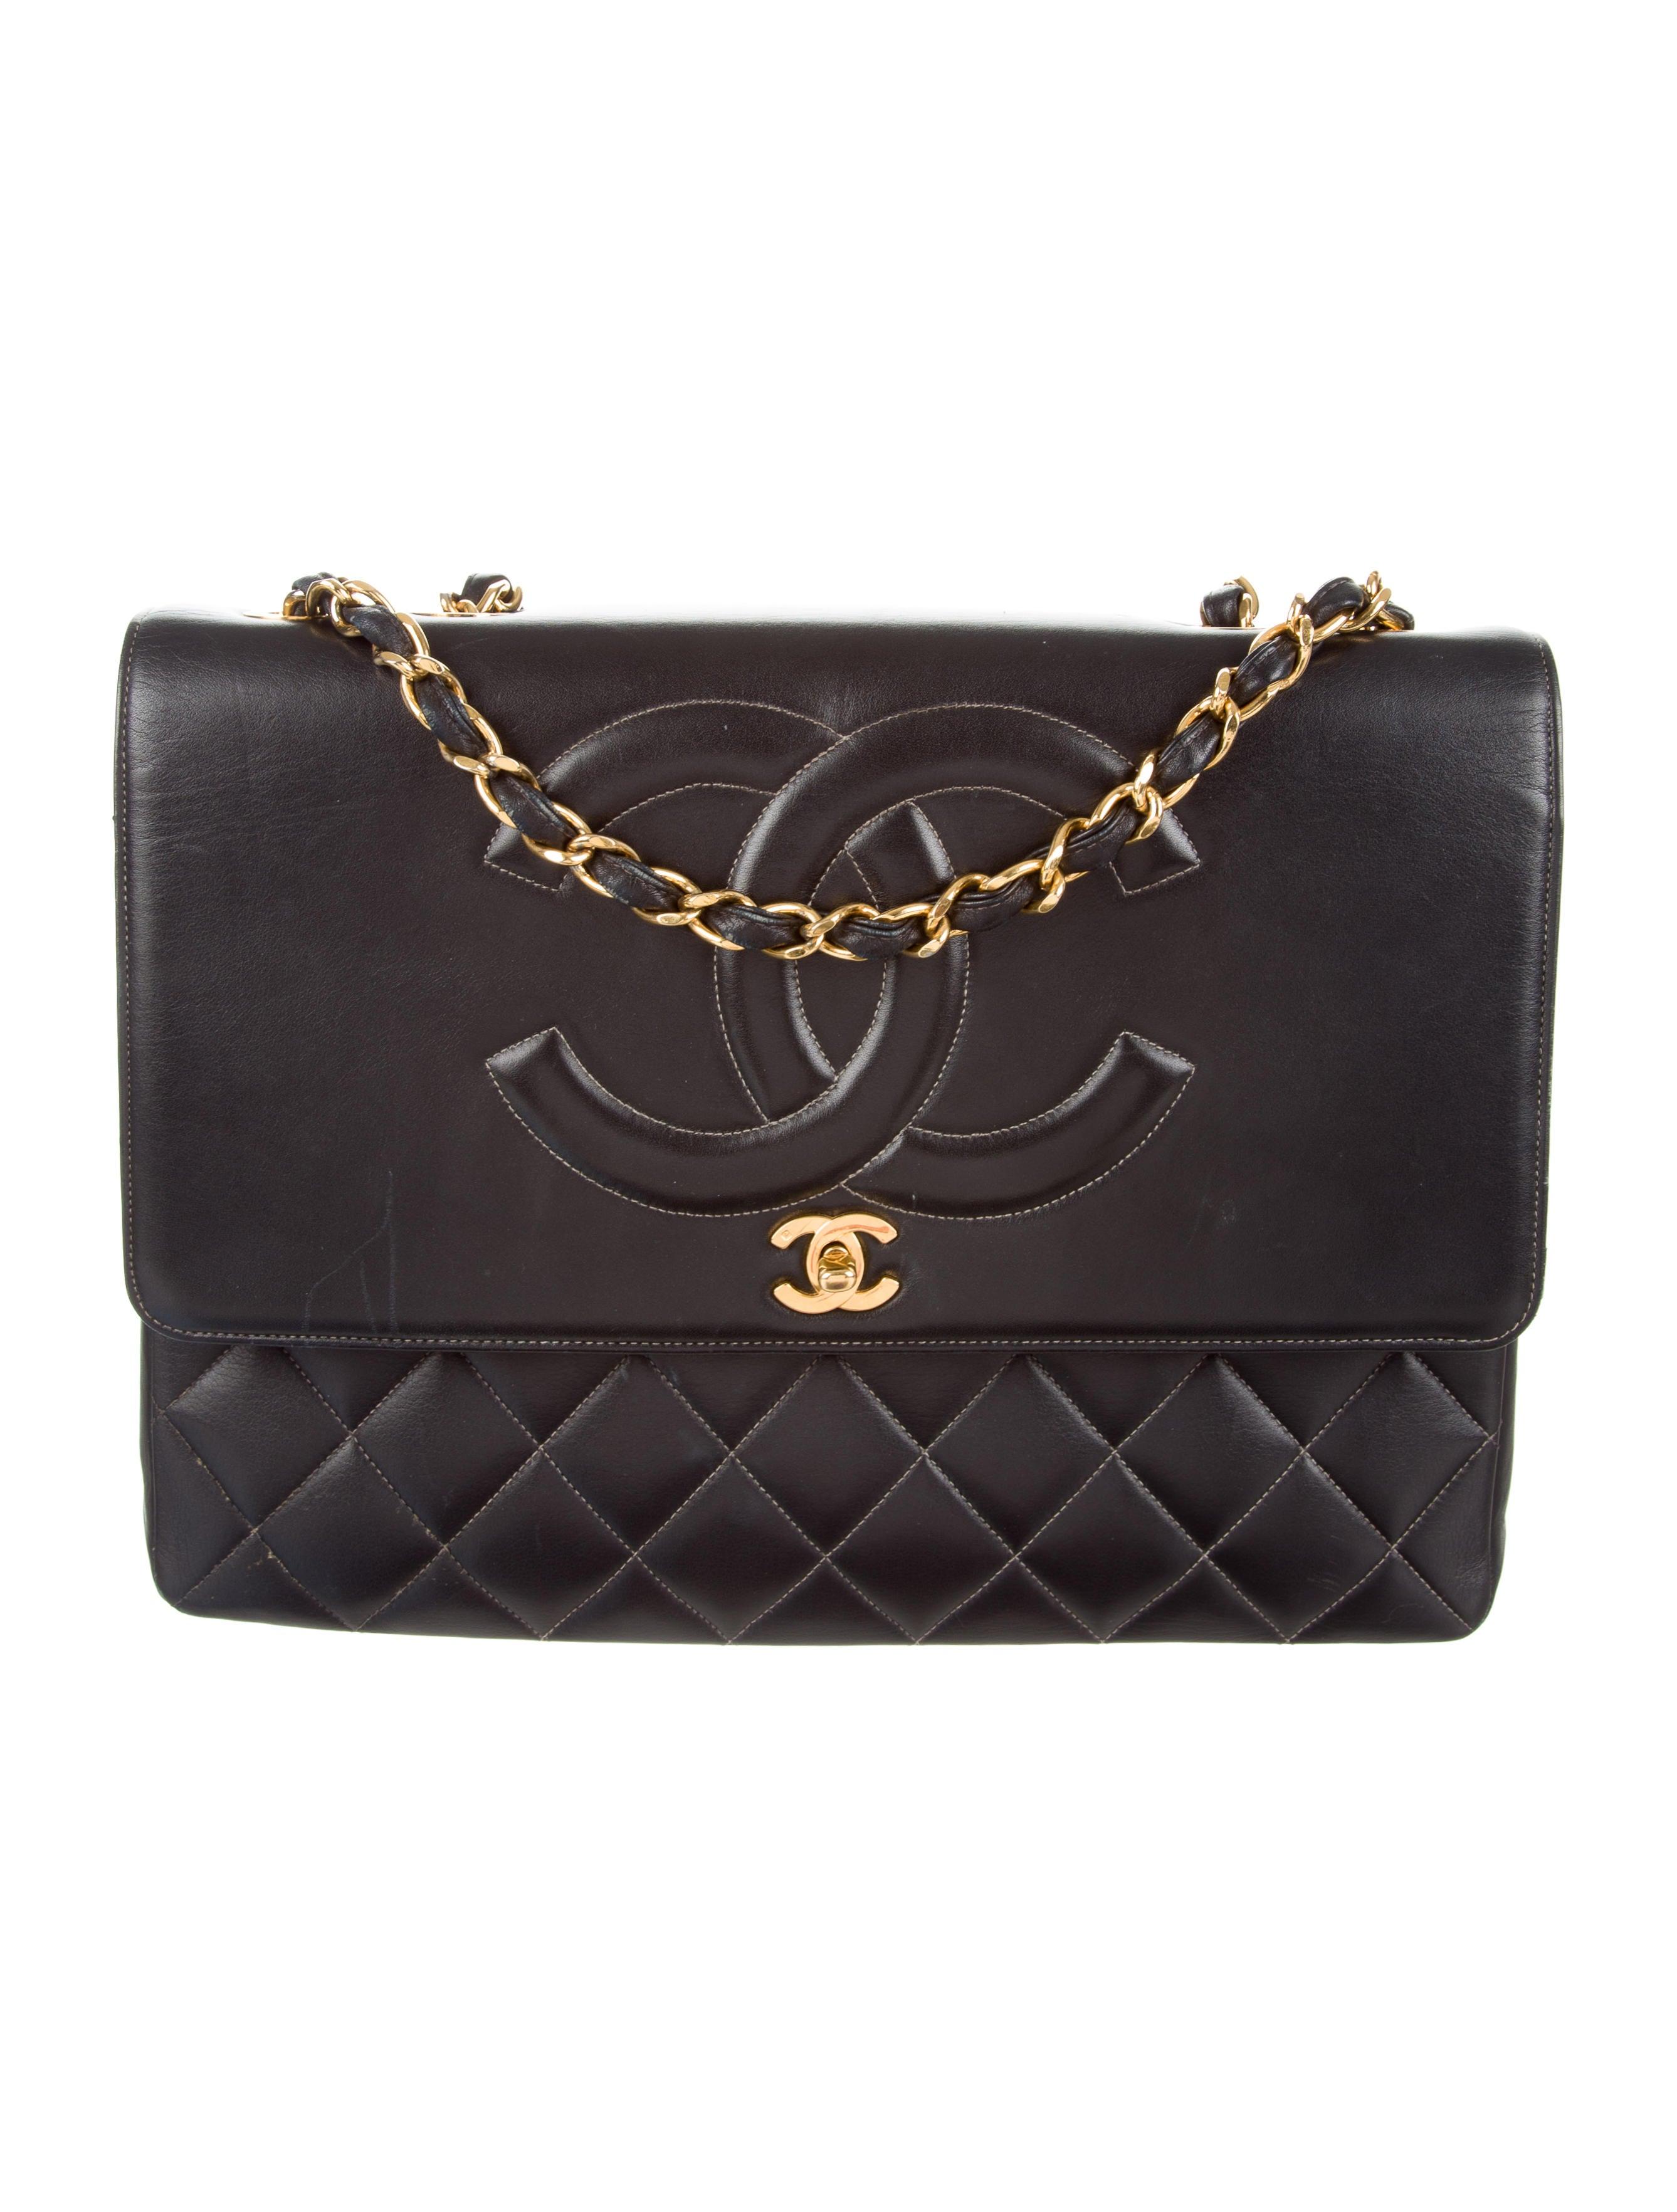 Chanel vintage cc shoulder bag handbags cha216197 - Vintage chanel ...